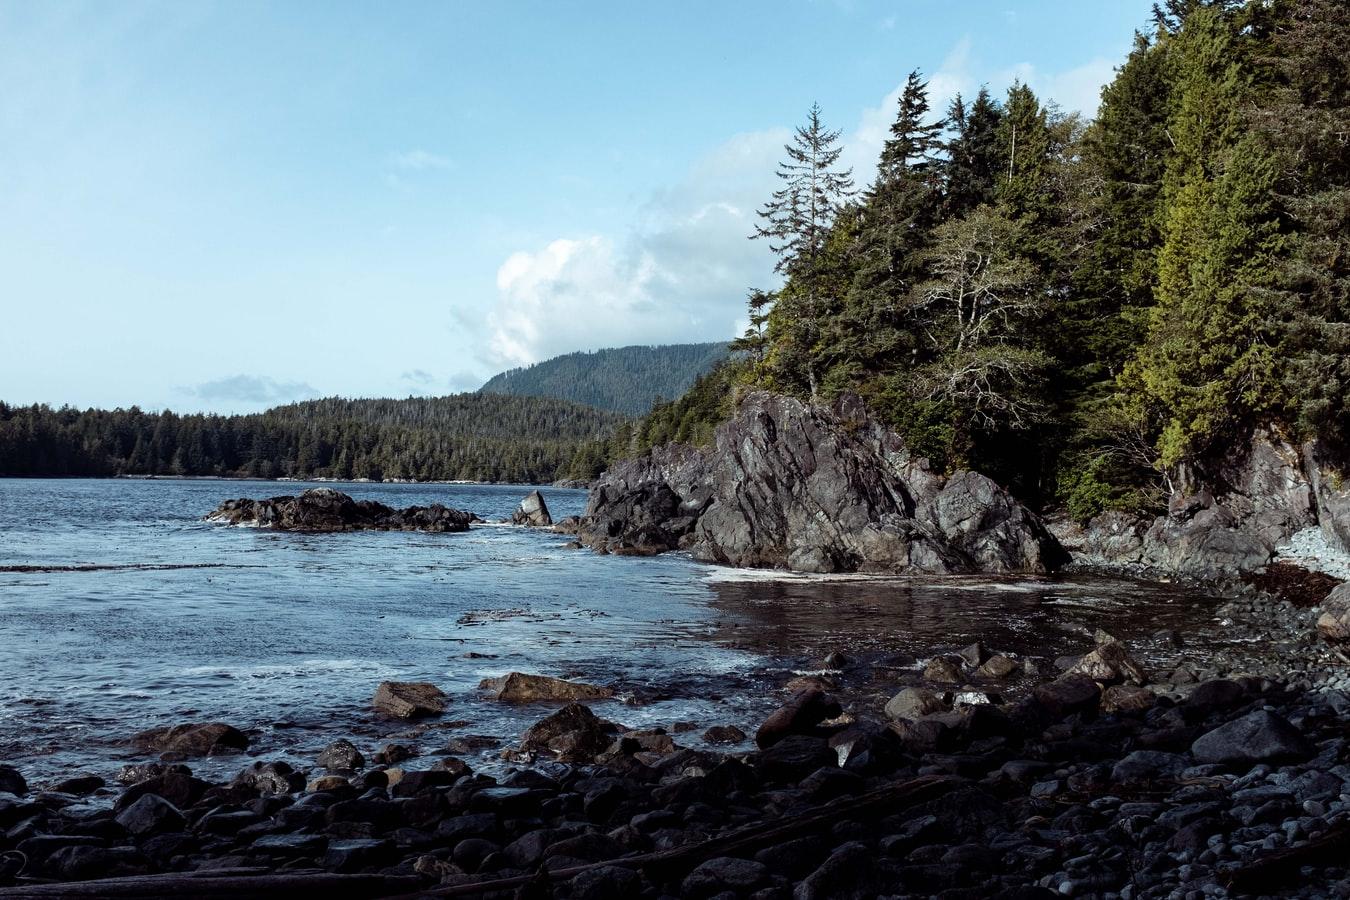 From Bonavista to Vancouver Island